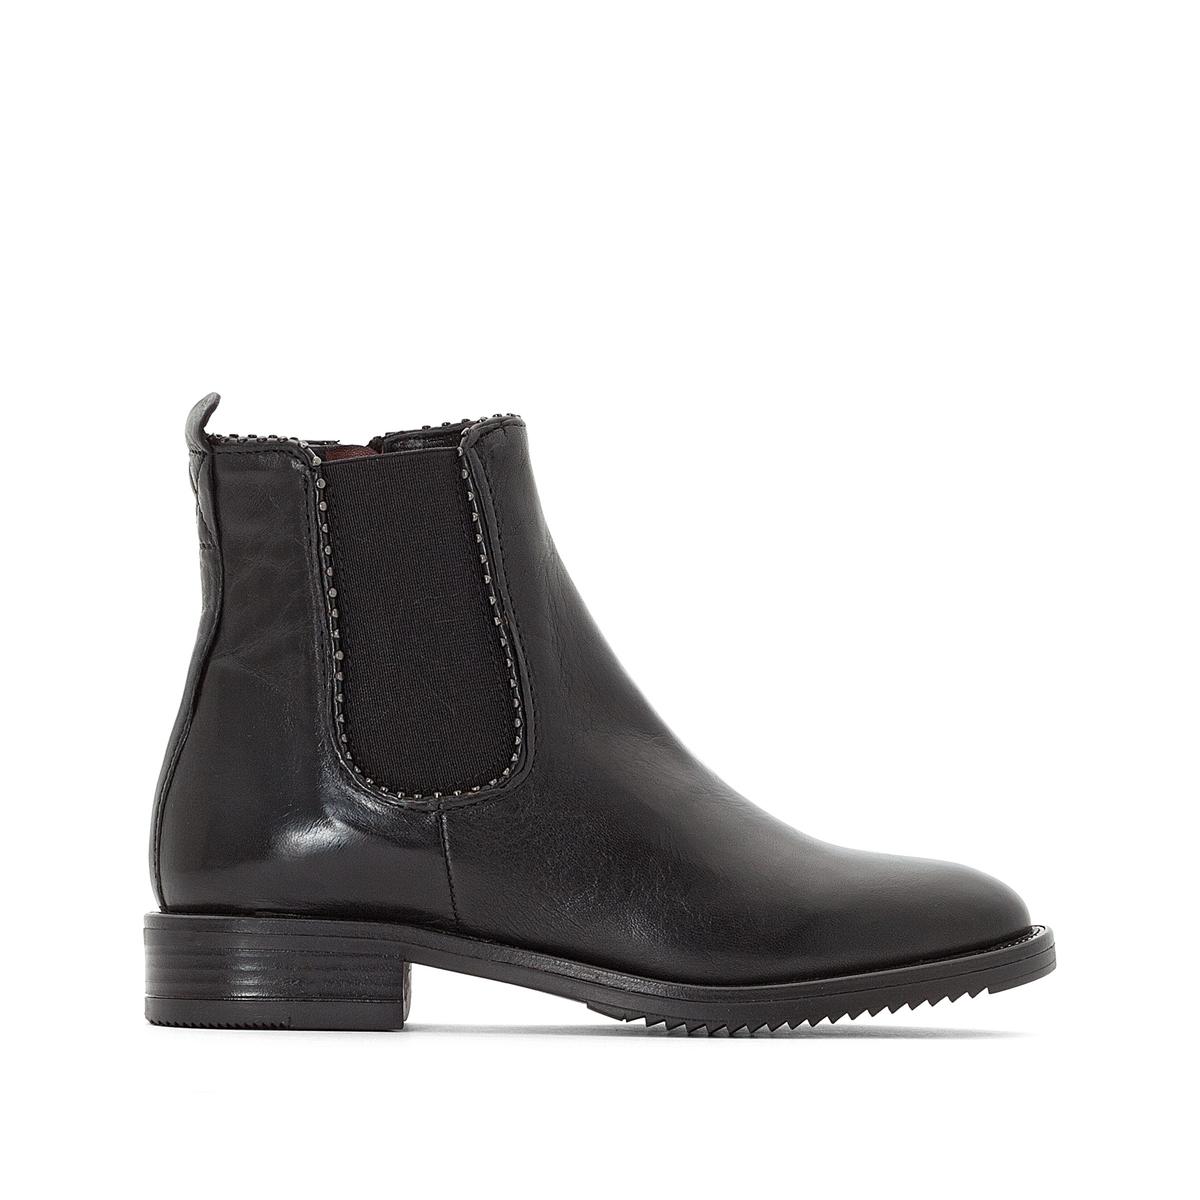 Ботинки-челси кожаные Zarko